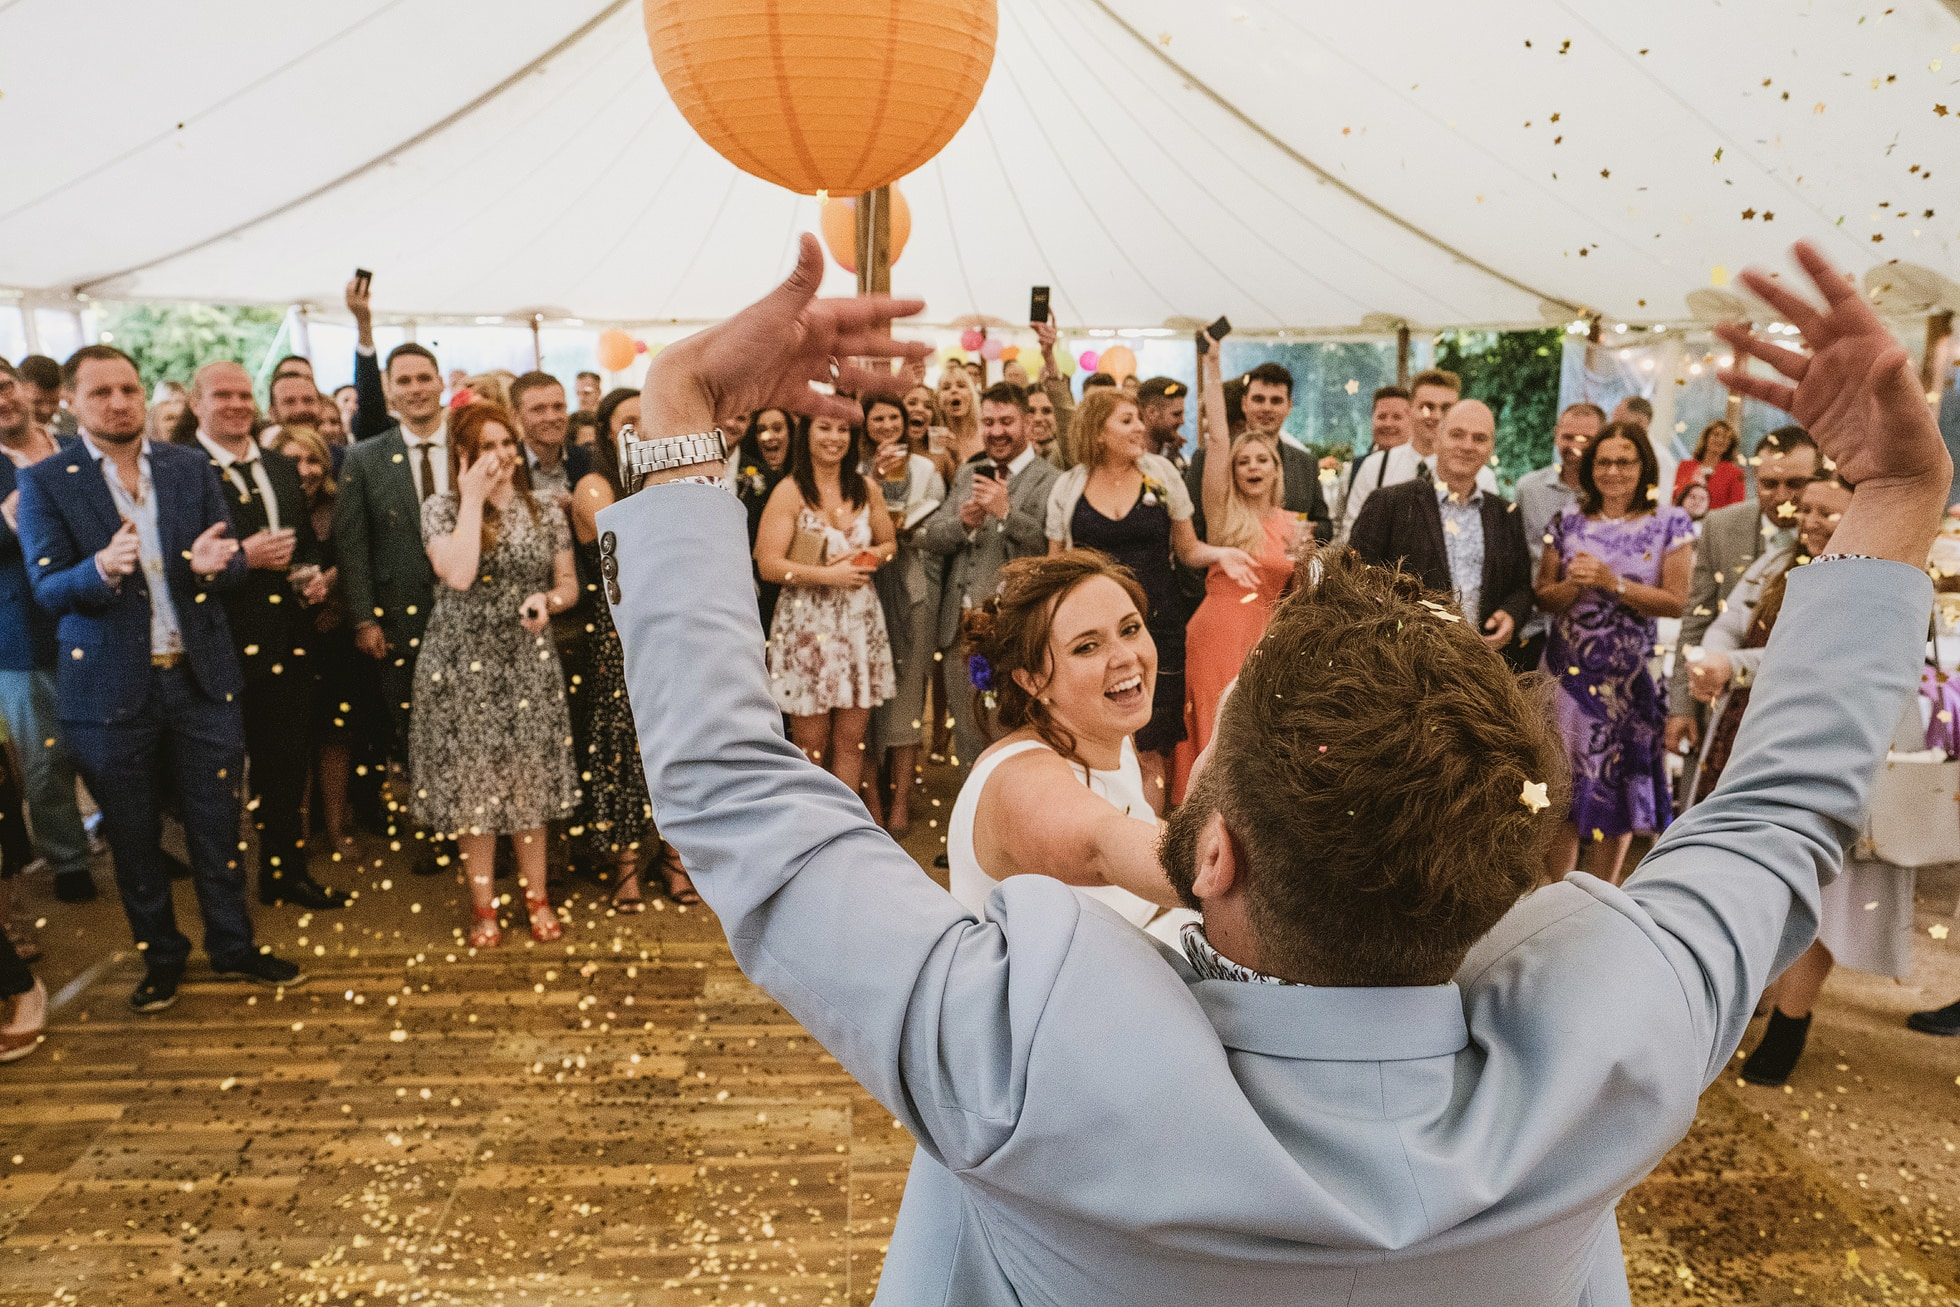 Outdoor Candid Wedding Photography